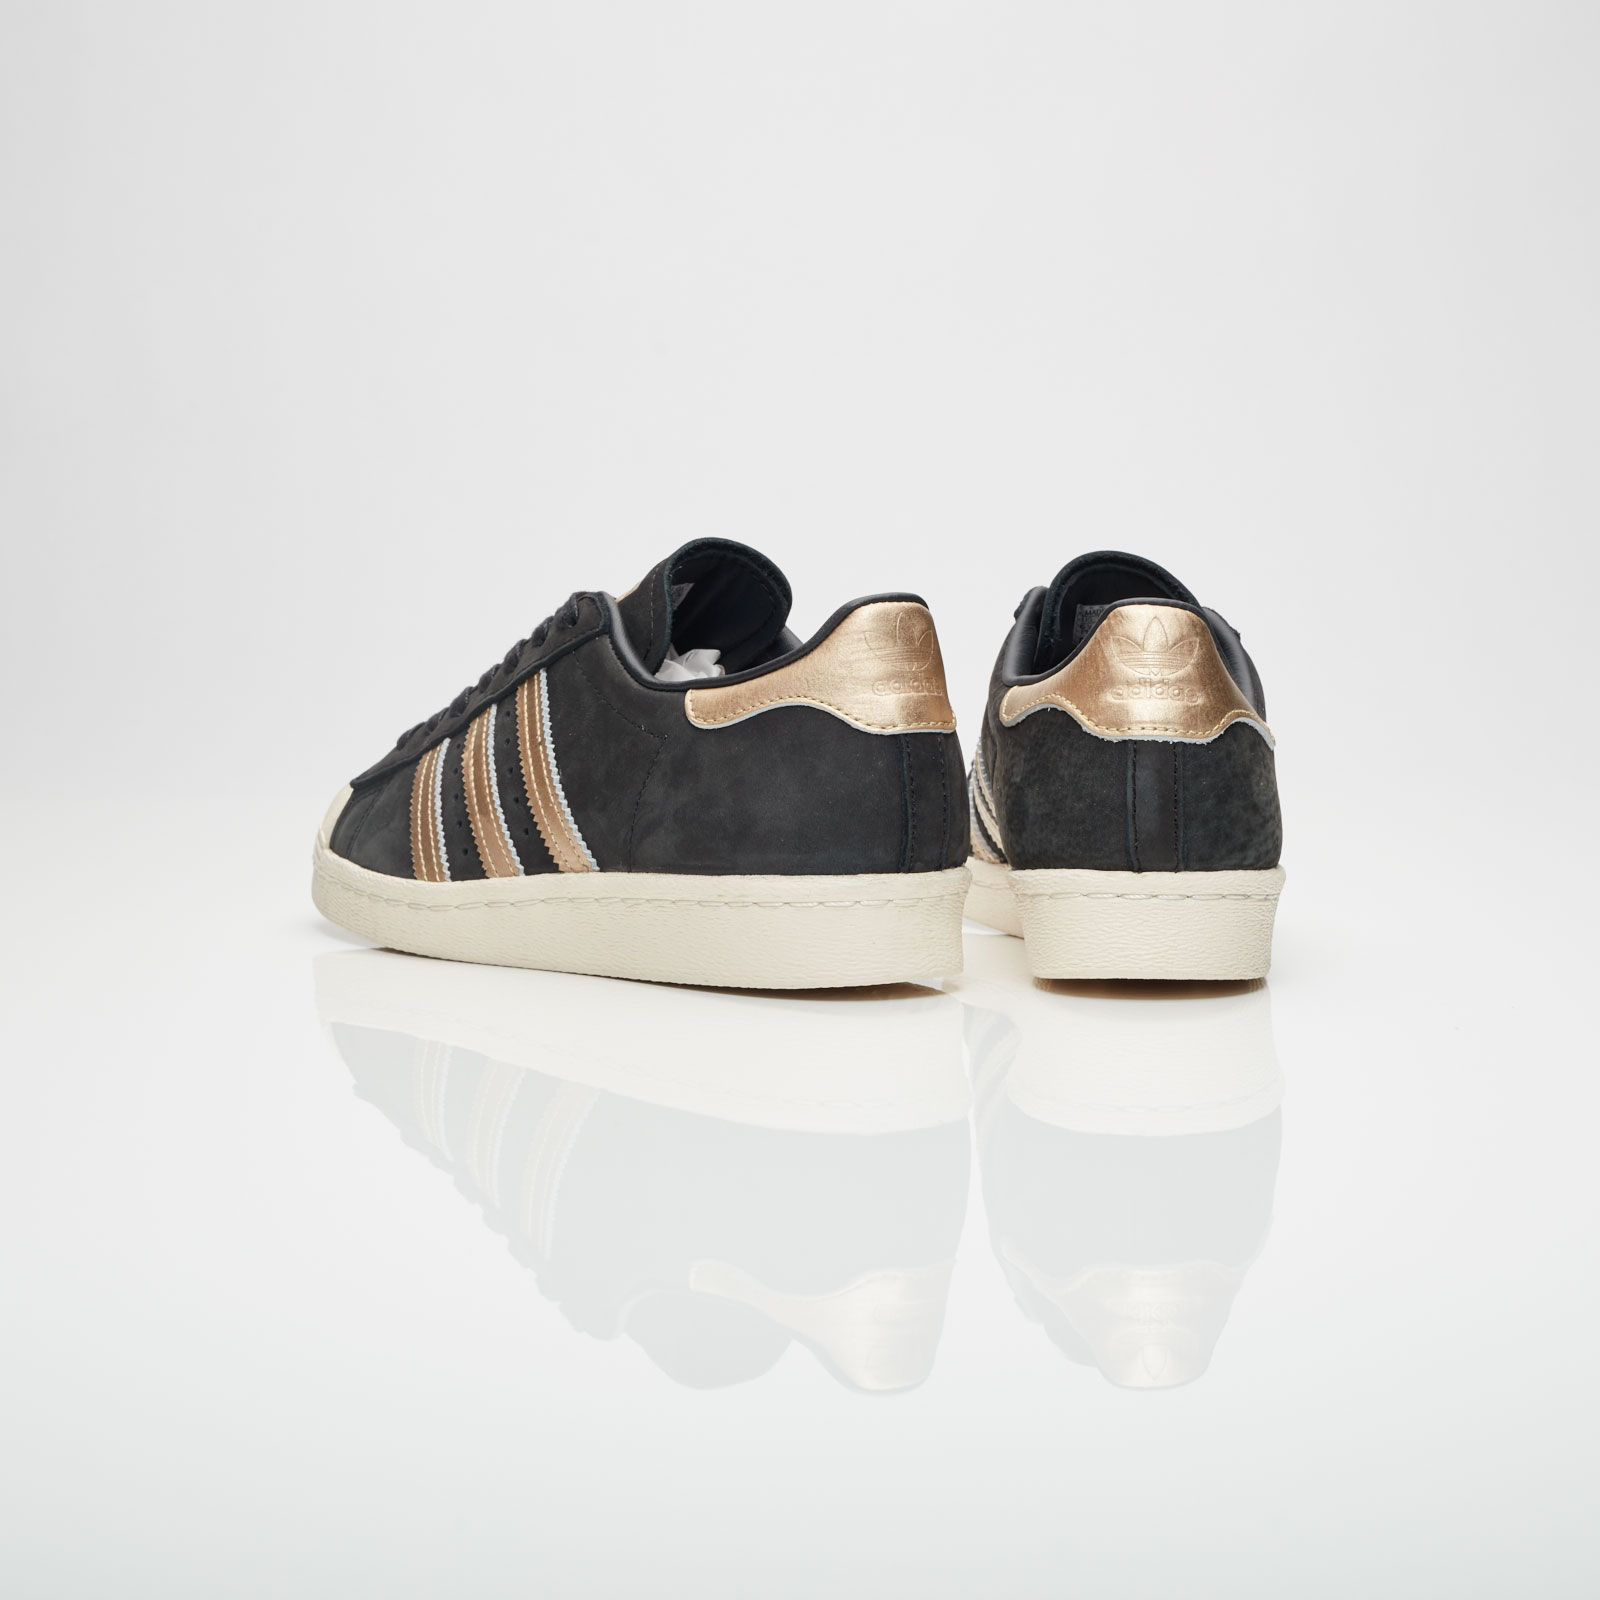 adidas Originals Superstar 80s 999 W adidas Originals Superstar 80s 999 W ...